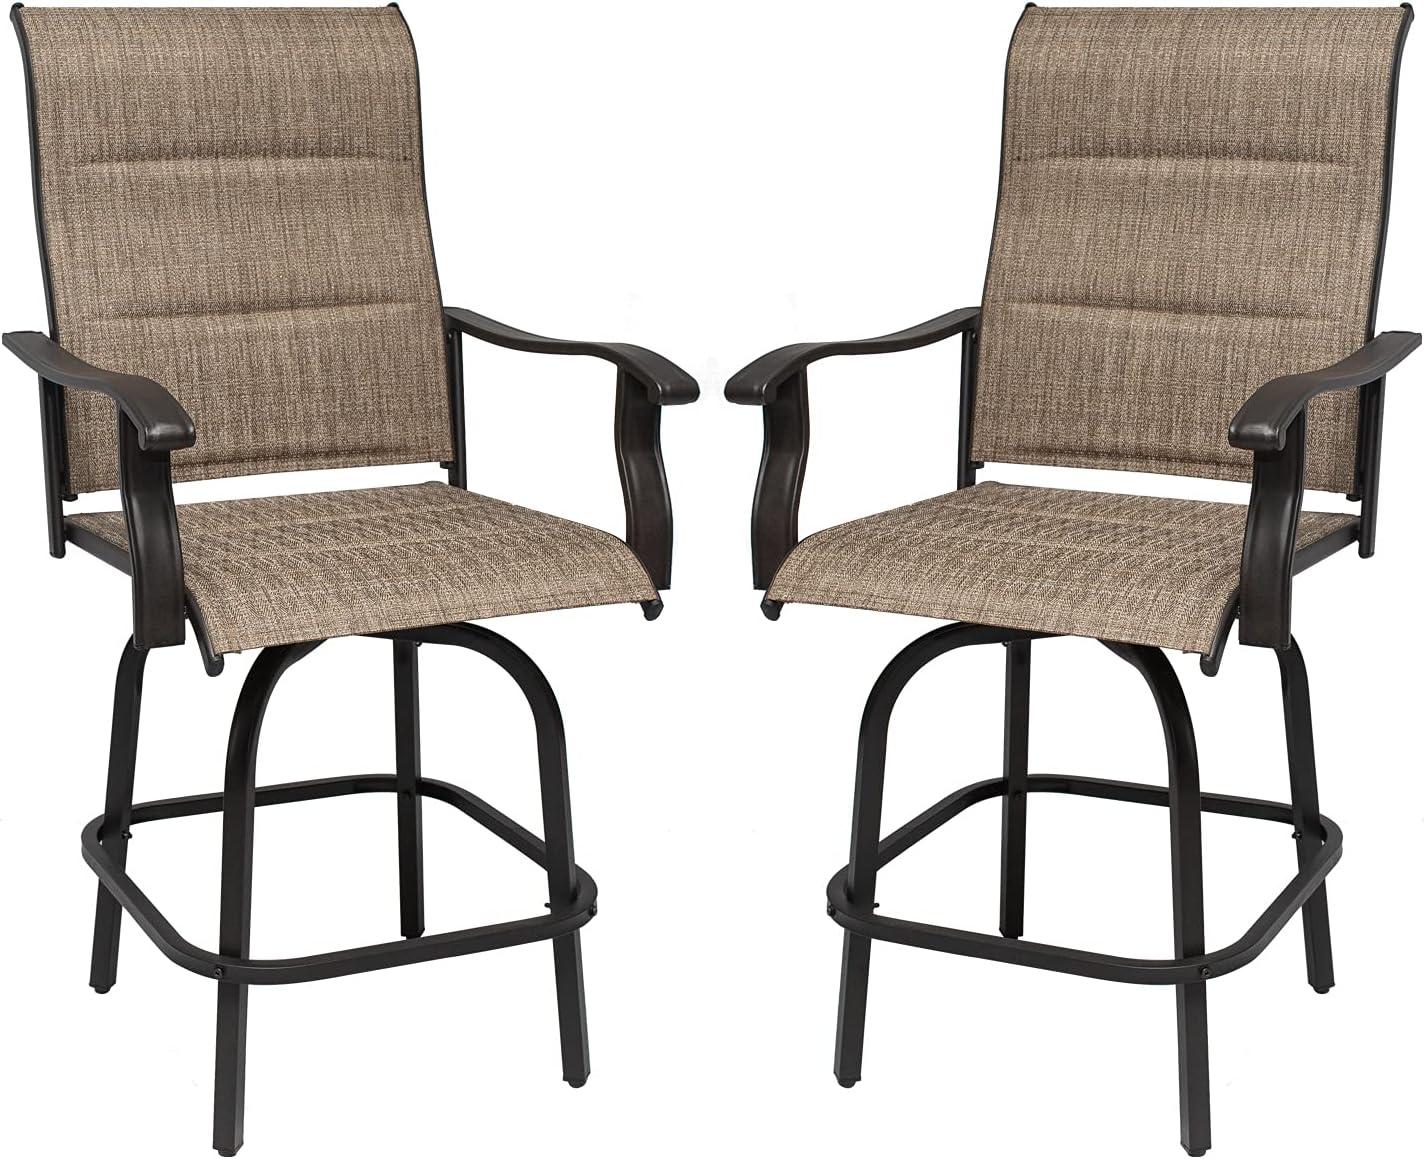 Outdoor Swivel Bar Stools 2 Popularity Pcs Furniture Set Hei Patio Bistro Ranking TOP6